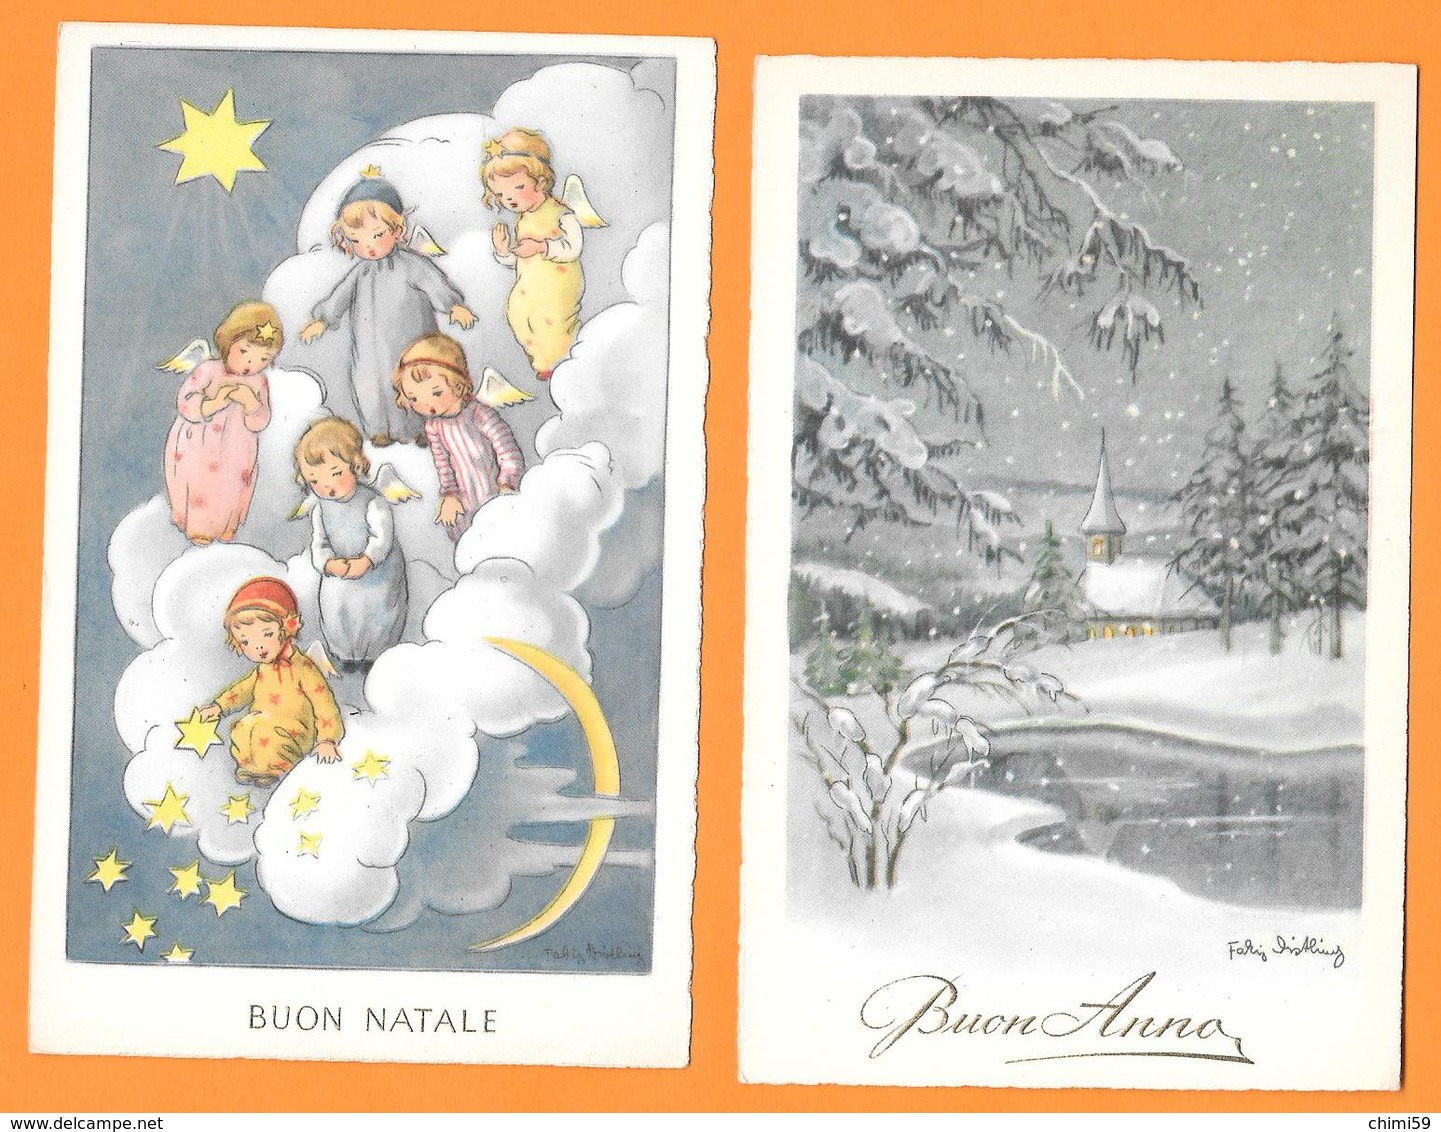 BUON NATALE - ANGELI - ANGELS - PAESAGGIO INNEVATO - 2 CARTOLINE - Natale